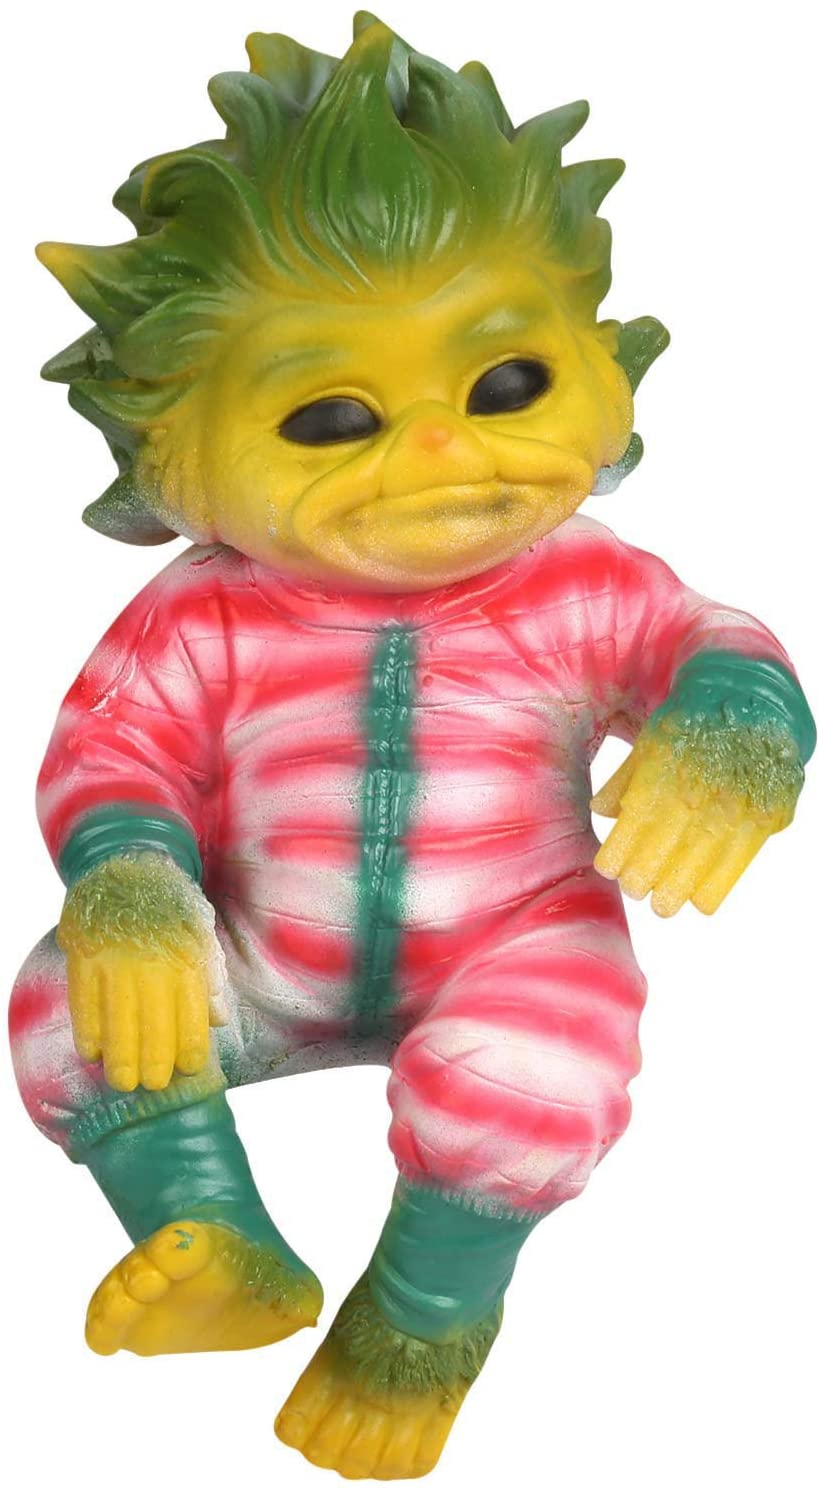 Rxan Grinch Doll Toy, Reborn Baby Grinch Toy Realistic Cartoon Doll Christmas Simualtion Doll with Glass Eyes